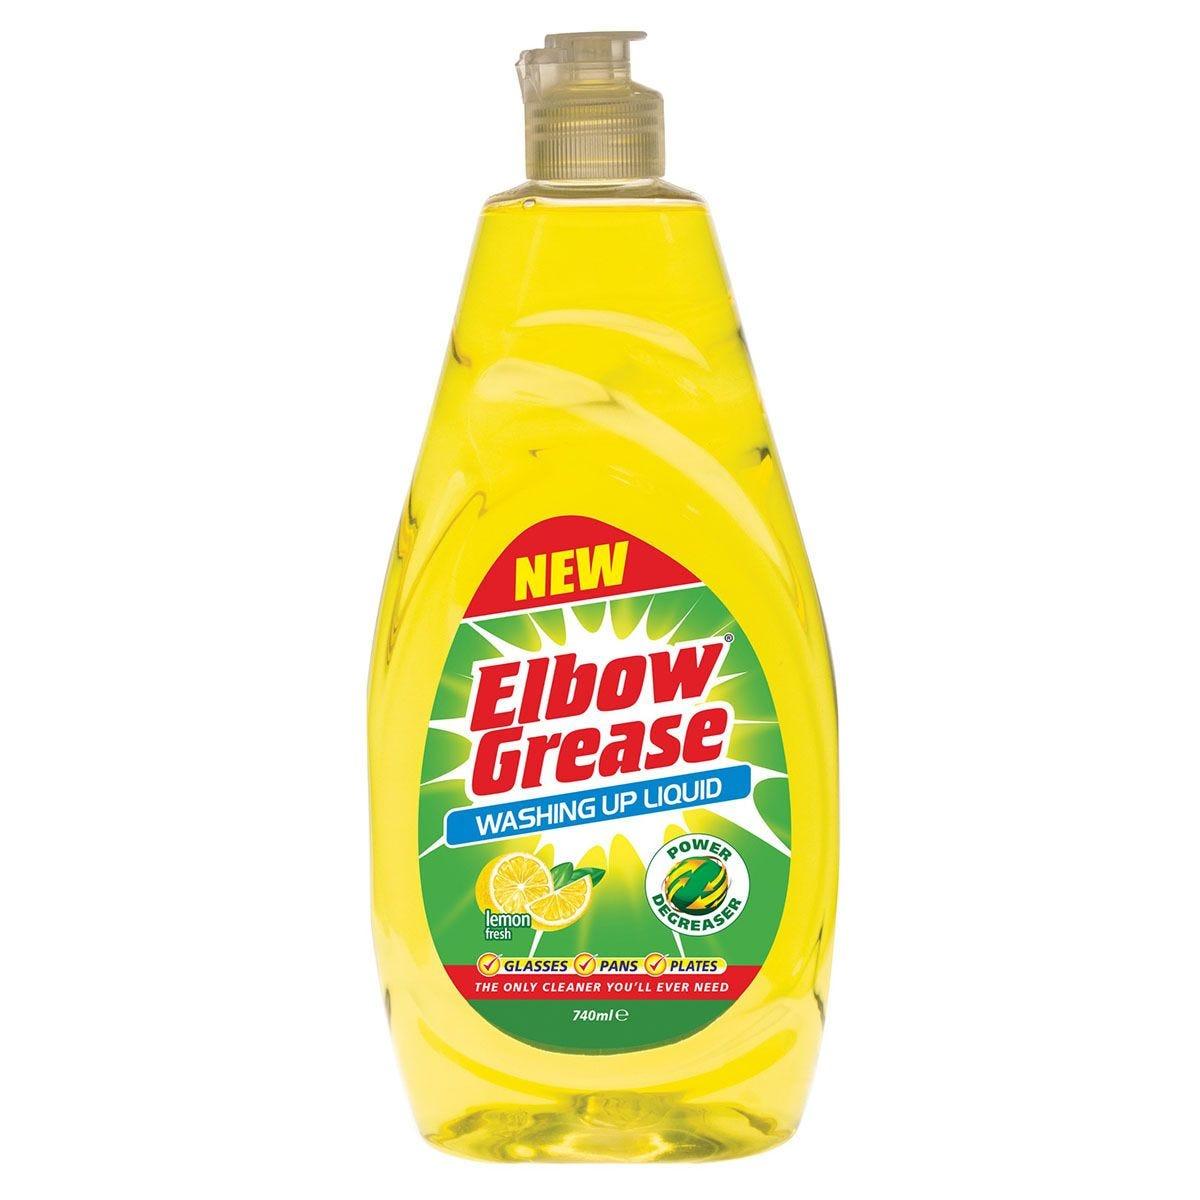 Elbow Grease Washing Up Liquid - 740ml